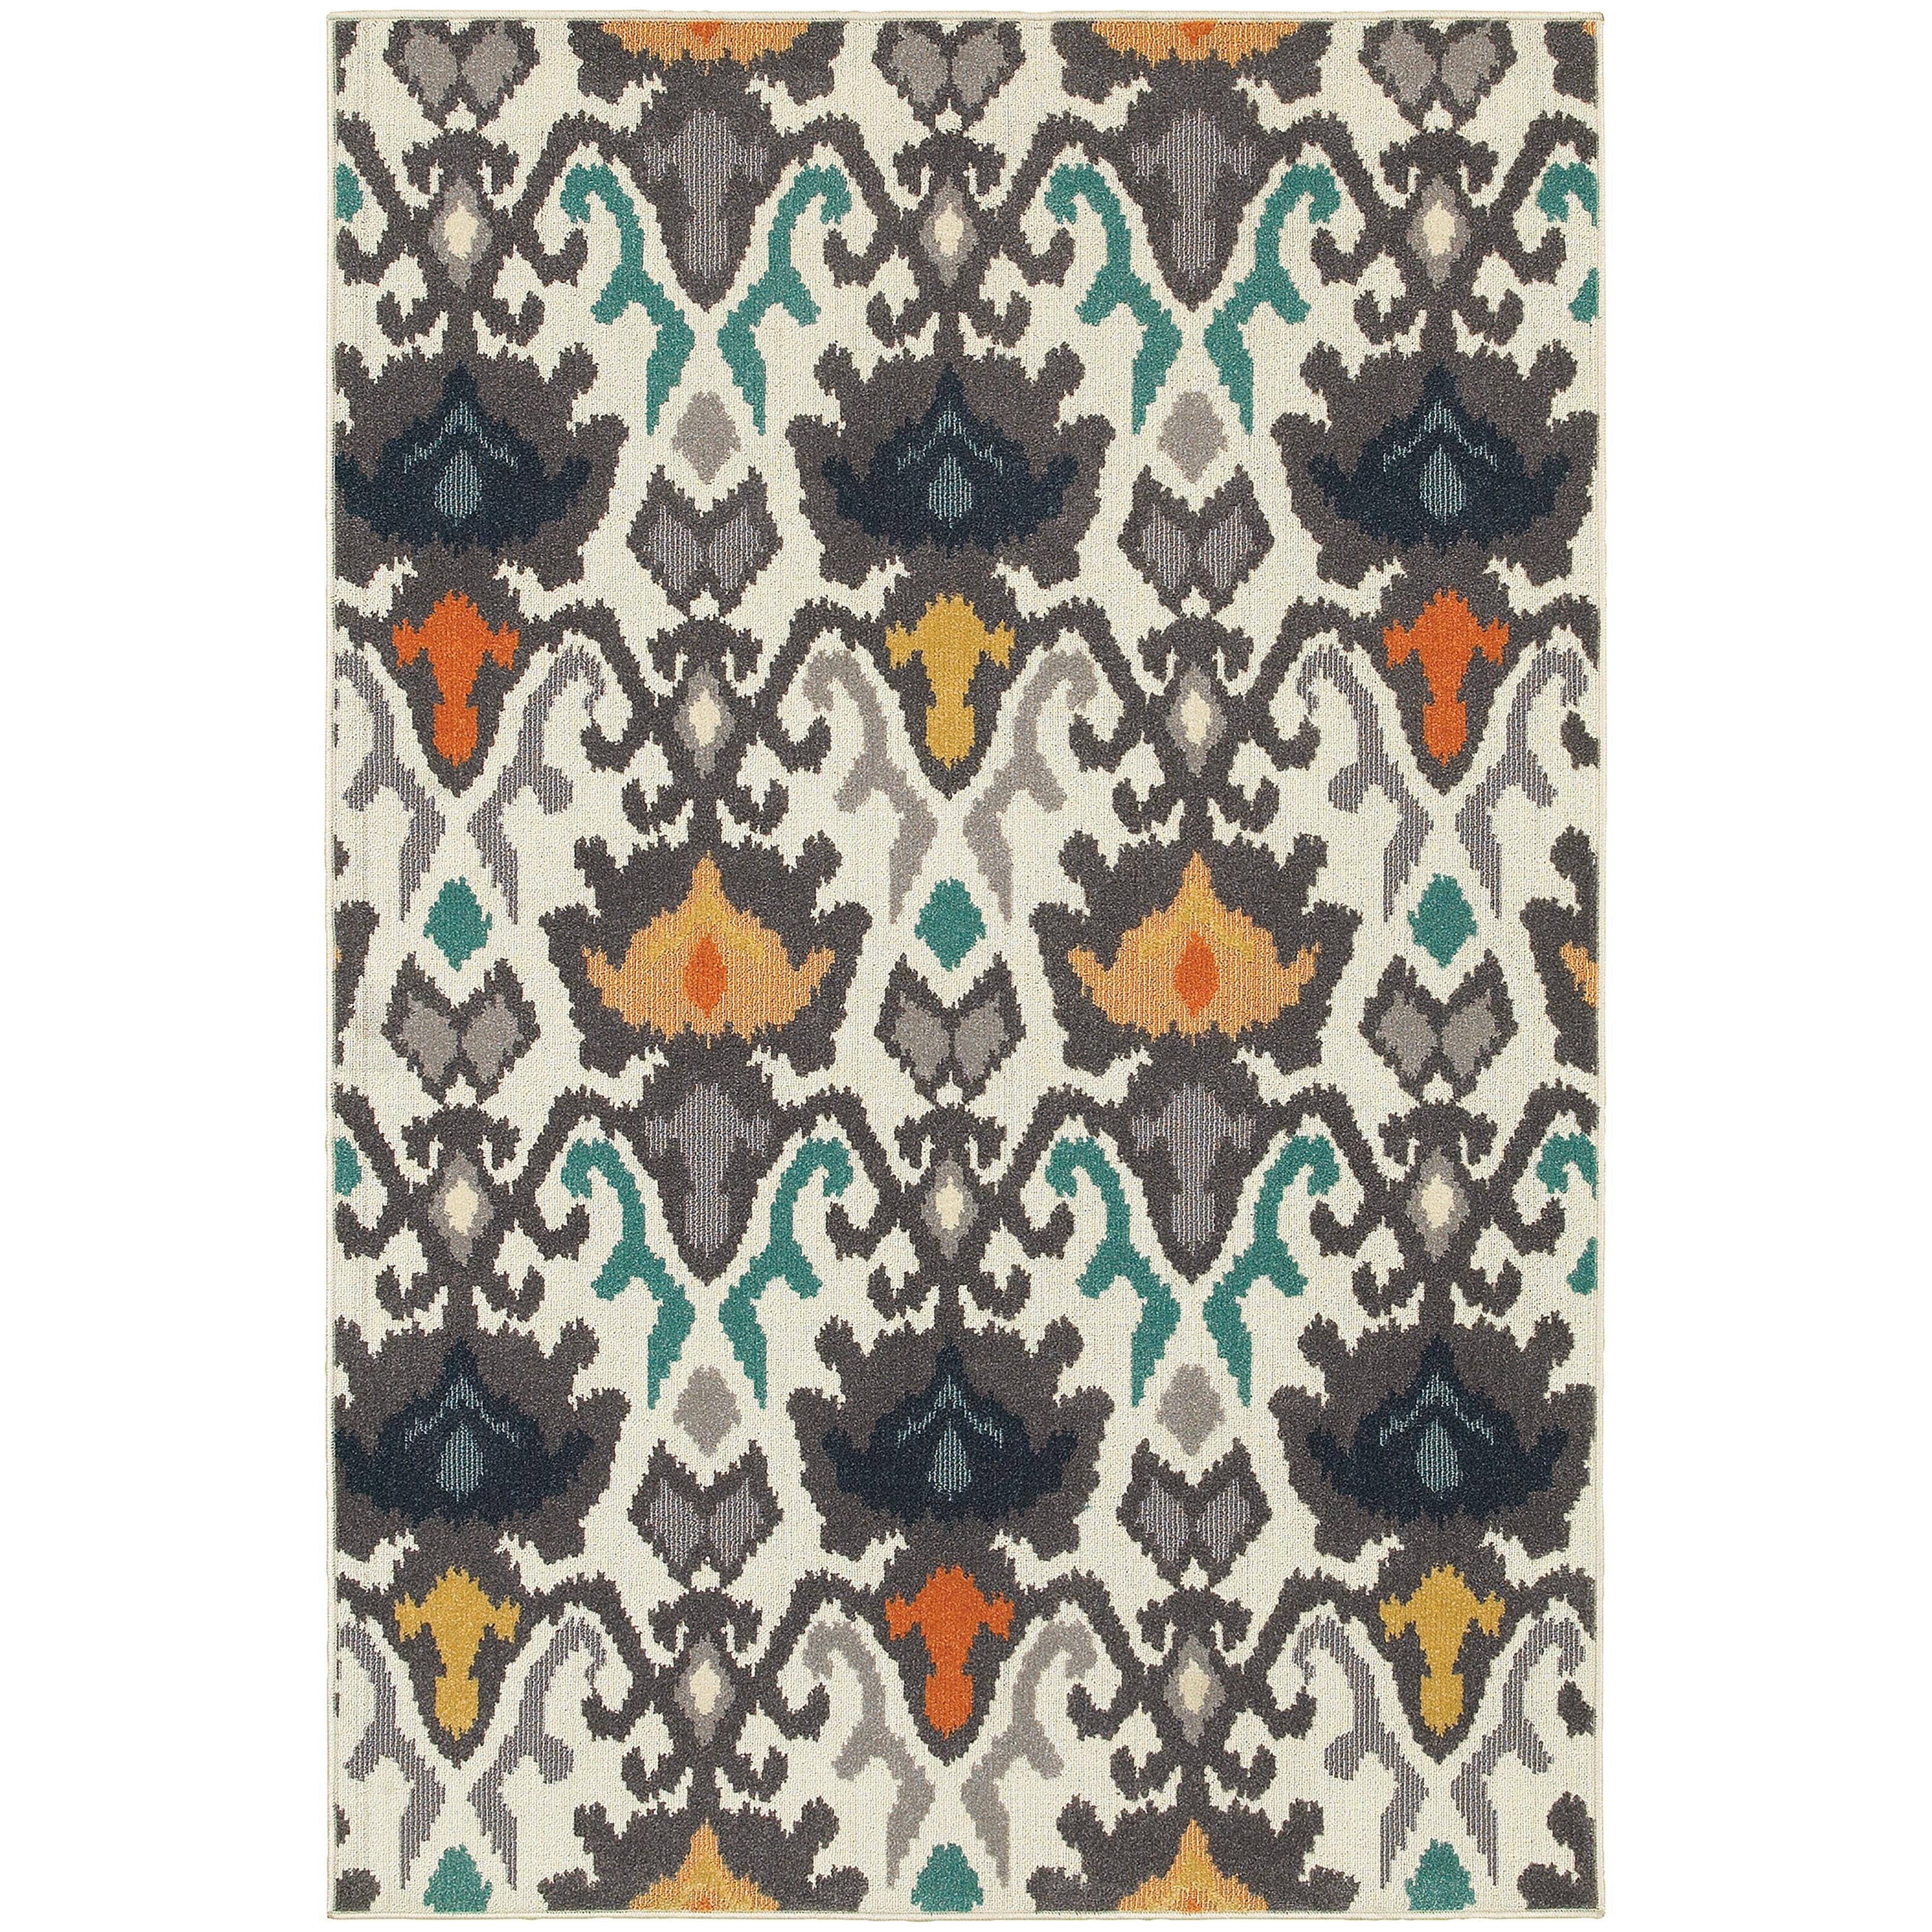 "Hampton 7'10"" X 10'10"" Rug by Oriental Weavers at Novello Home Furnishings"